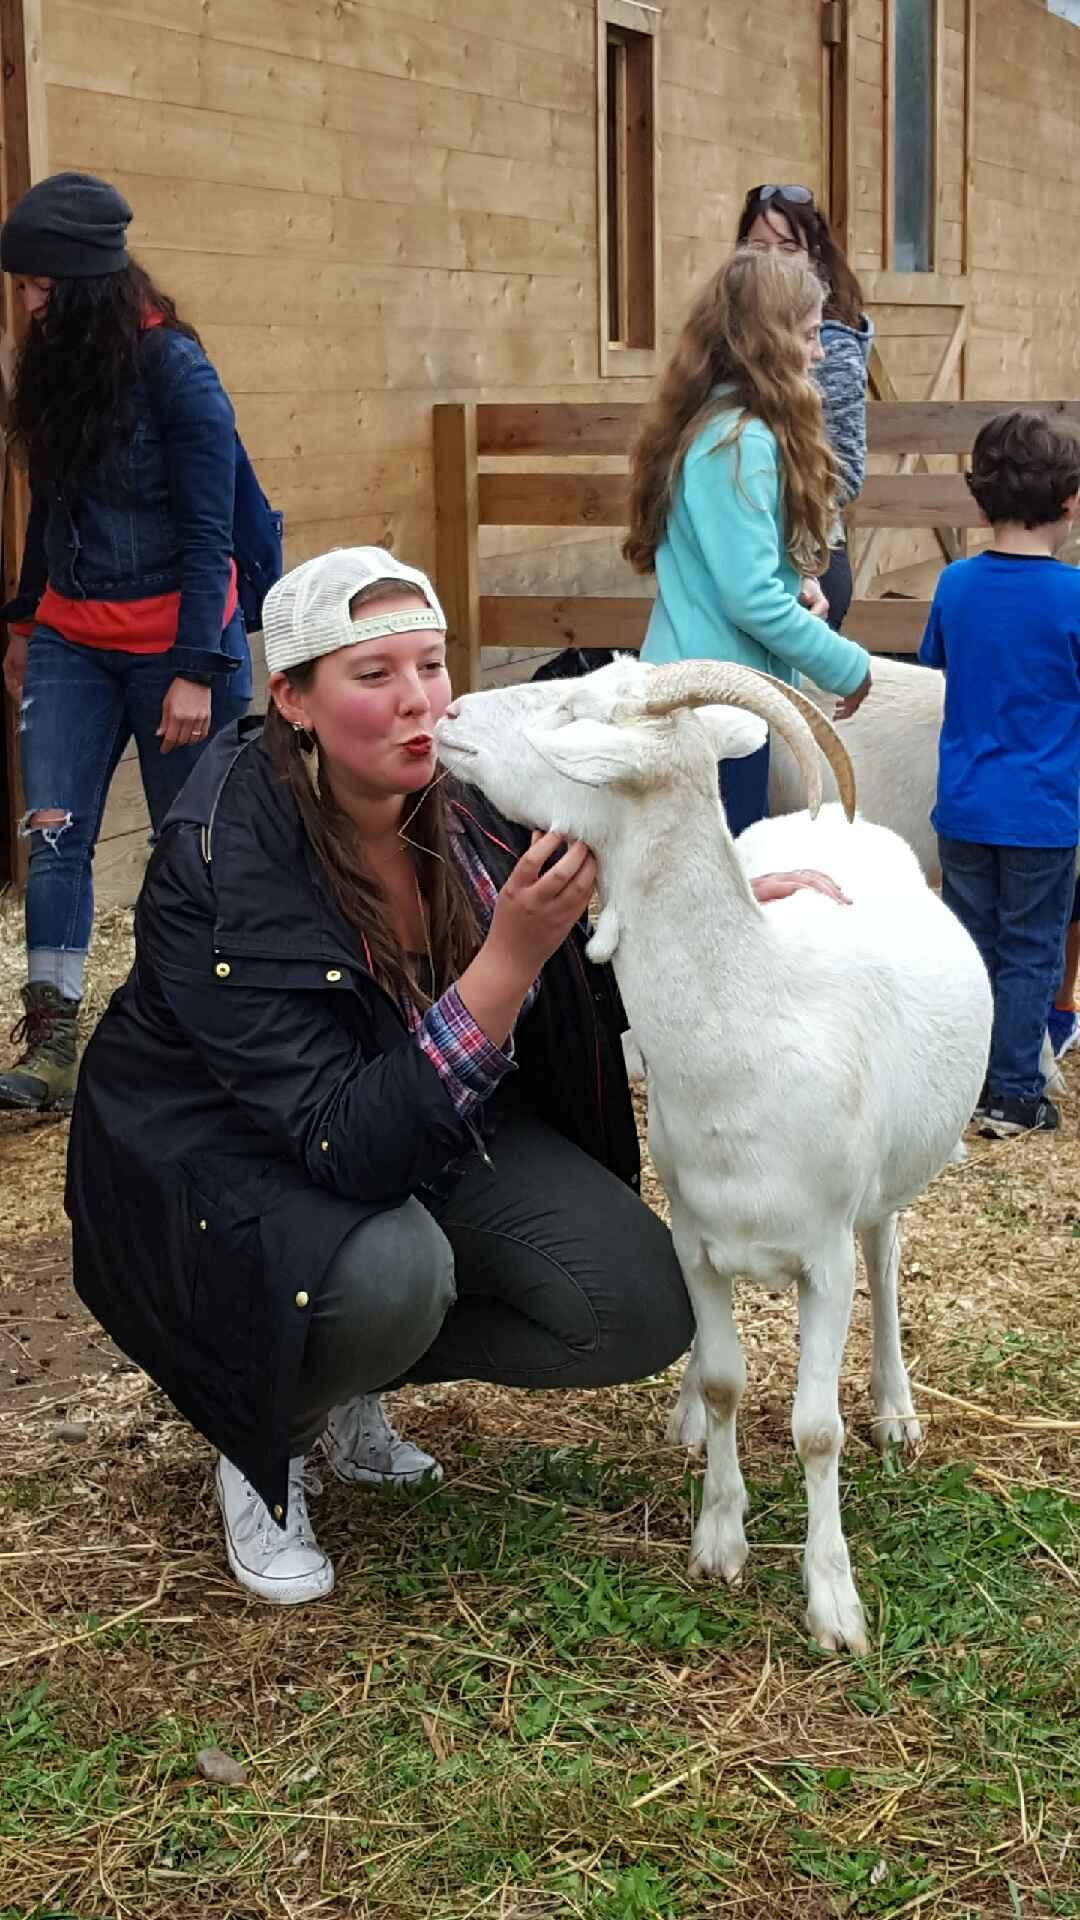 Woodstock Farm Sanctuary, 10/16